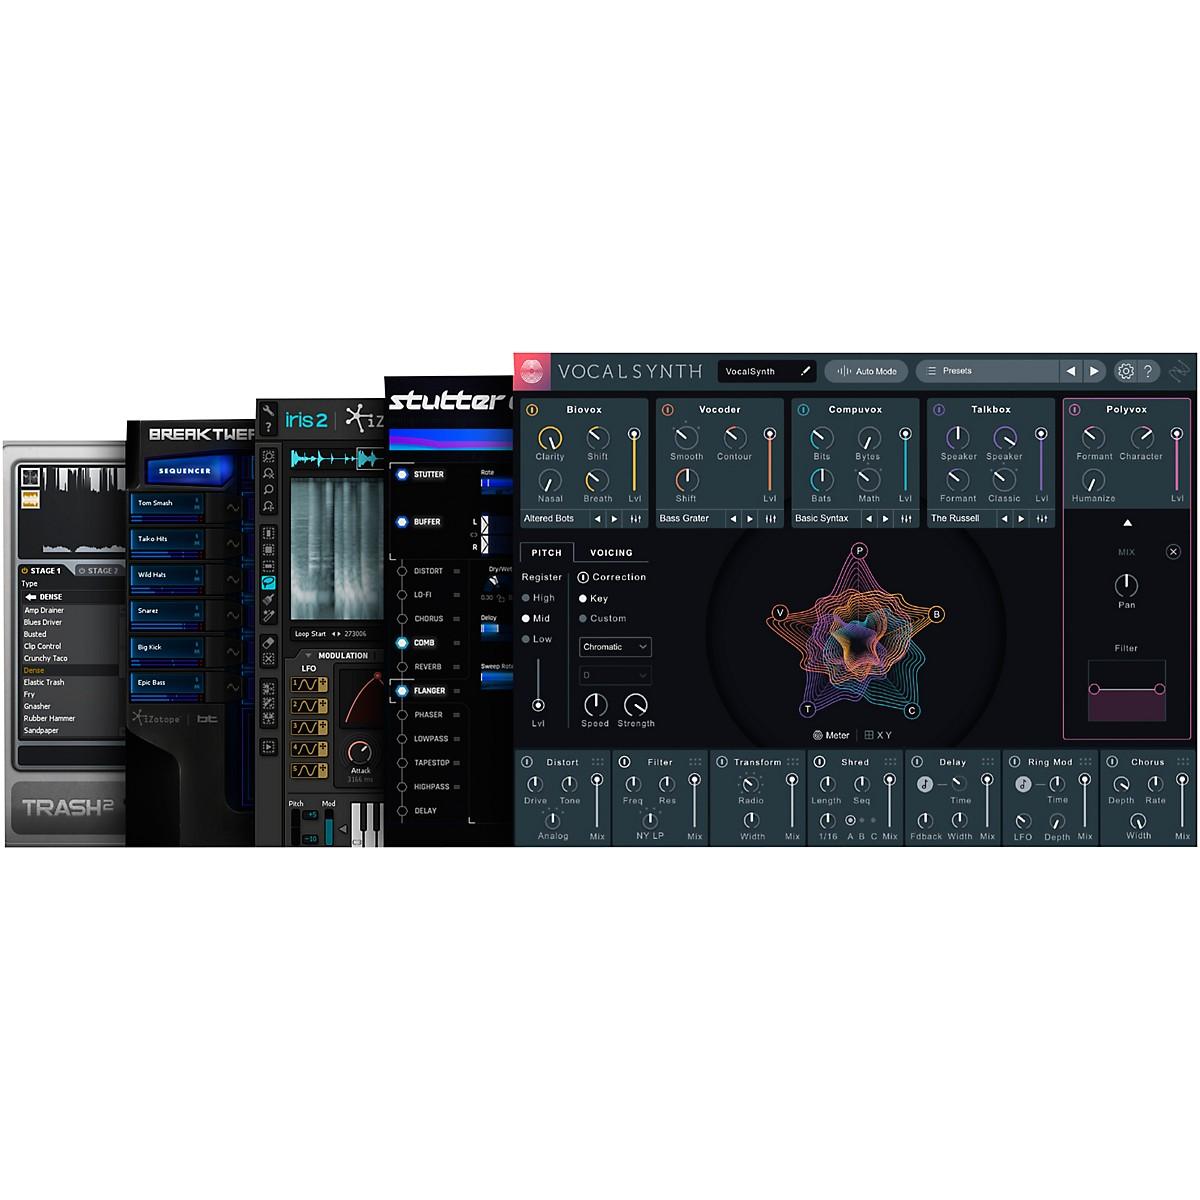 iZotope Creative Suite 2 EDU (Software Download)